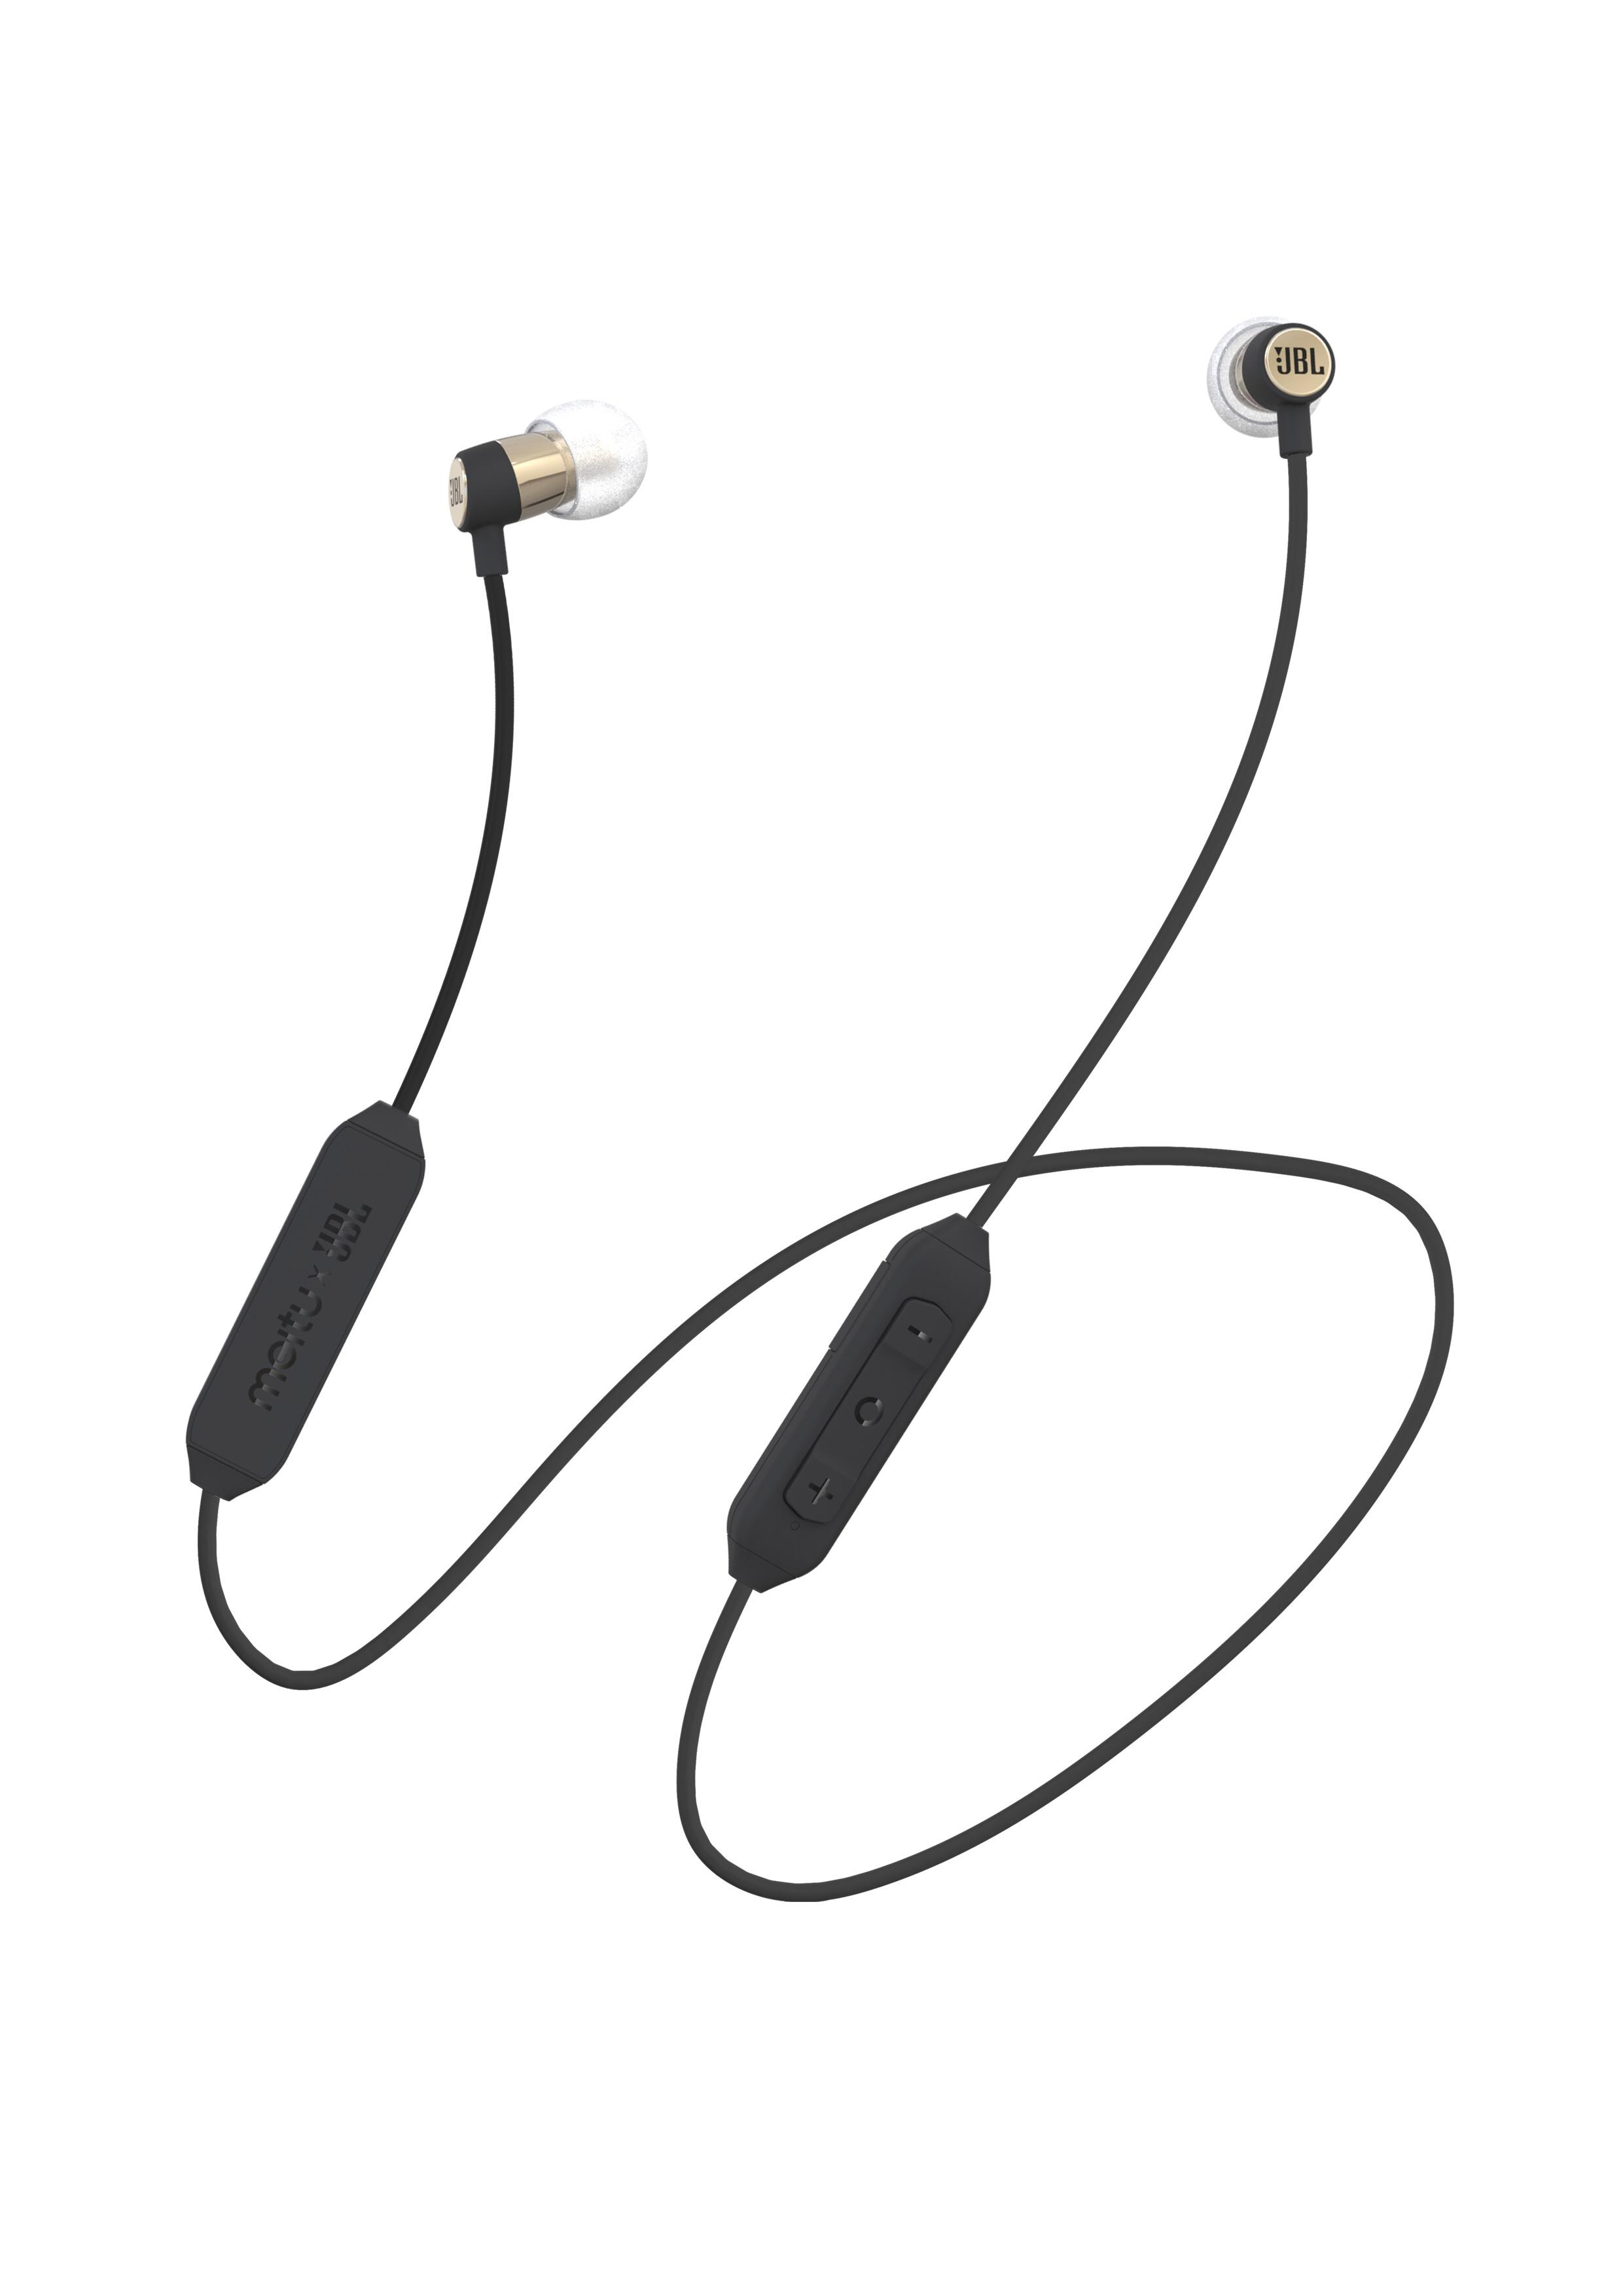 JBL M10BT蓝牙耳机无线入耳式耳机耳麦通用手机音乐耳塞低音